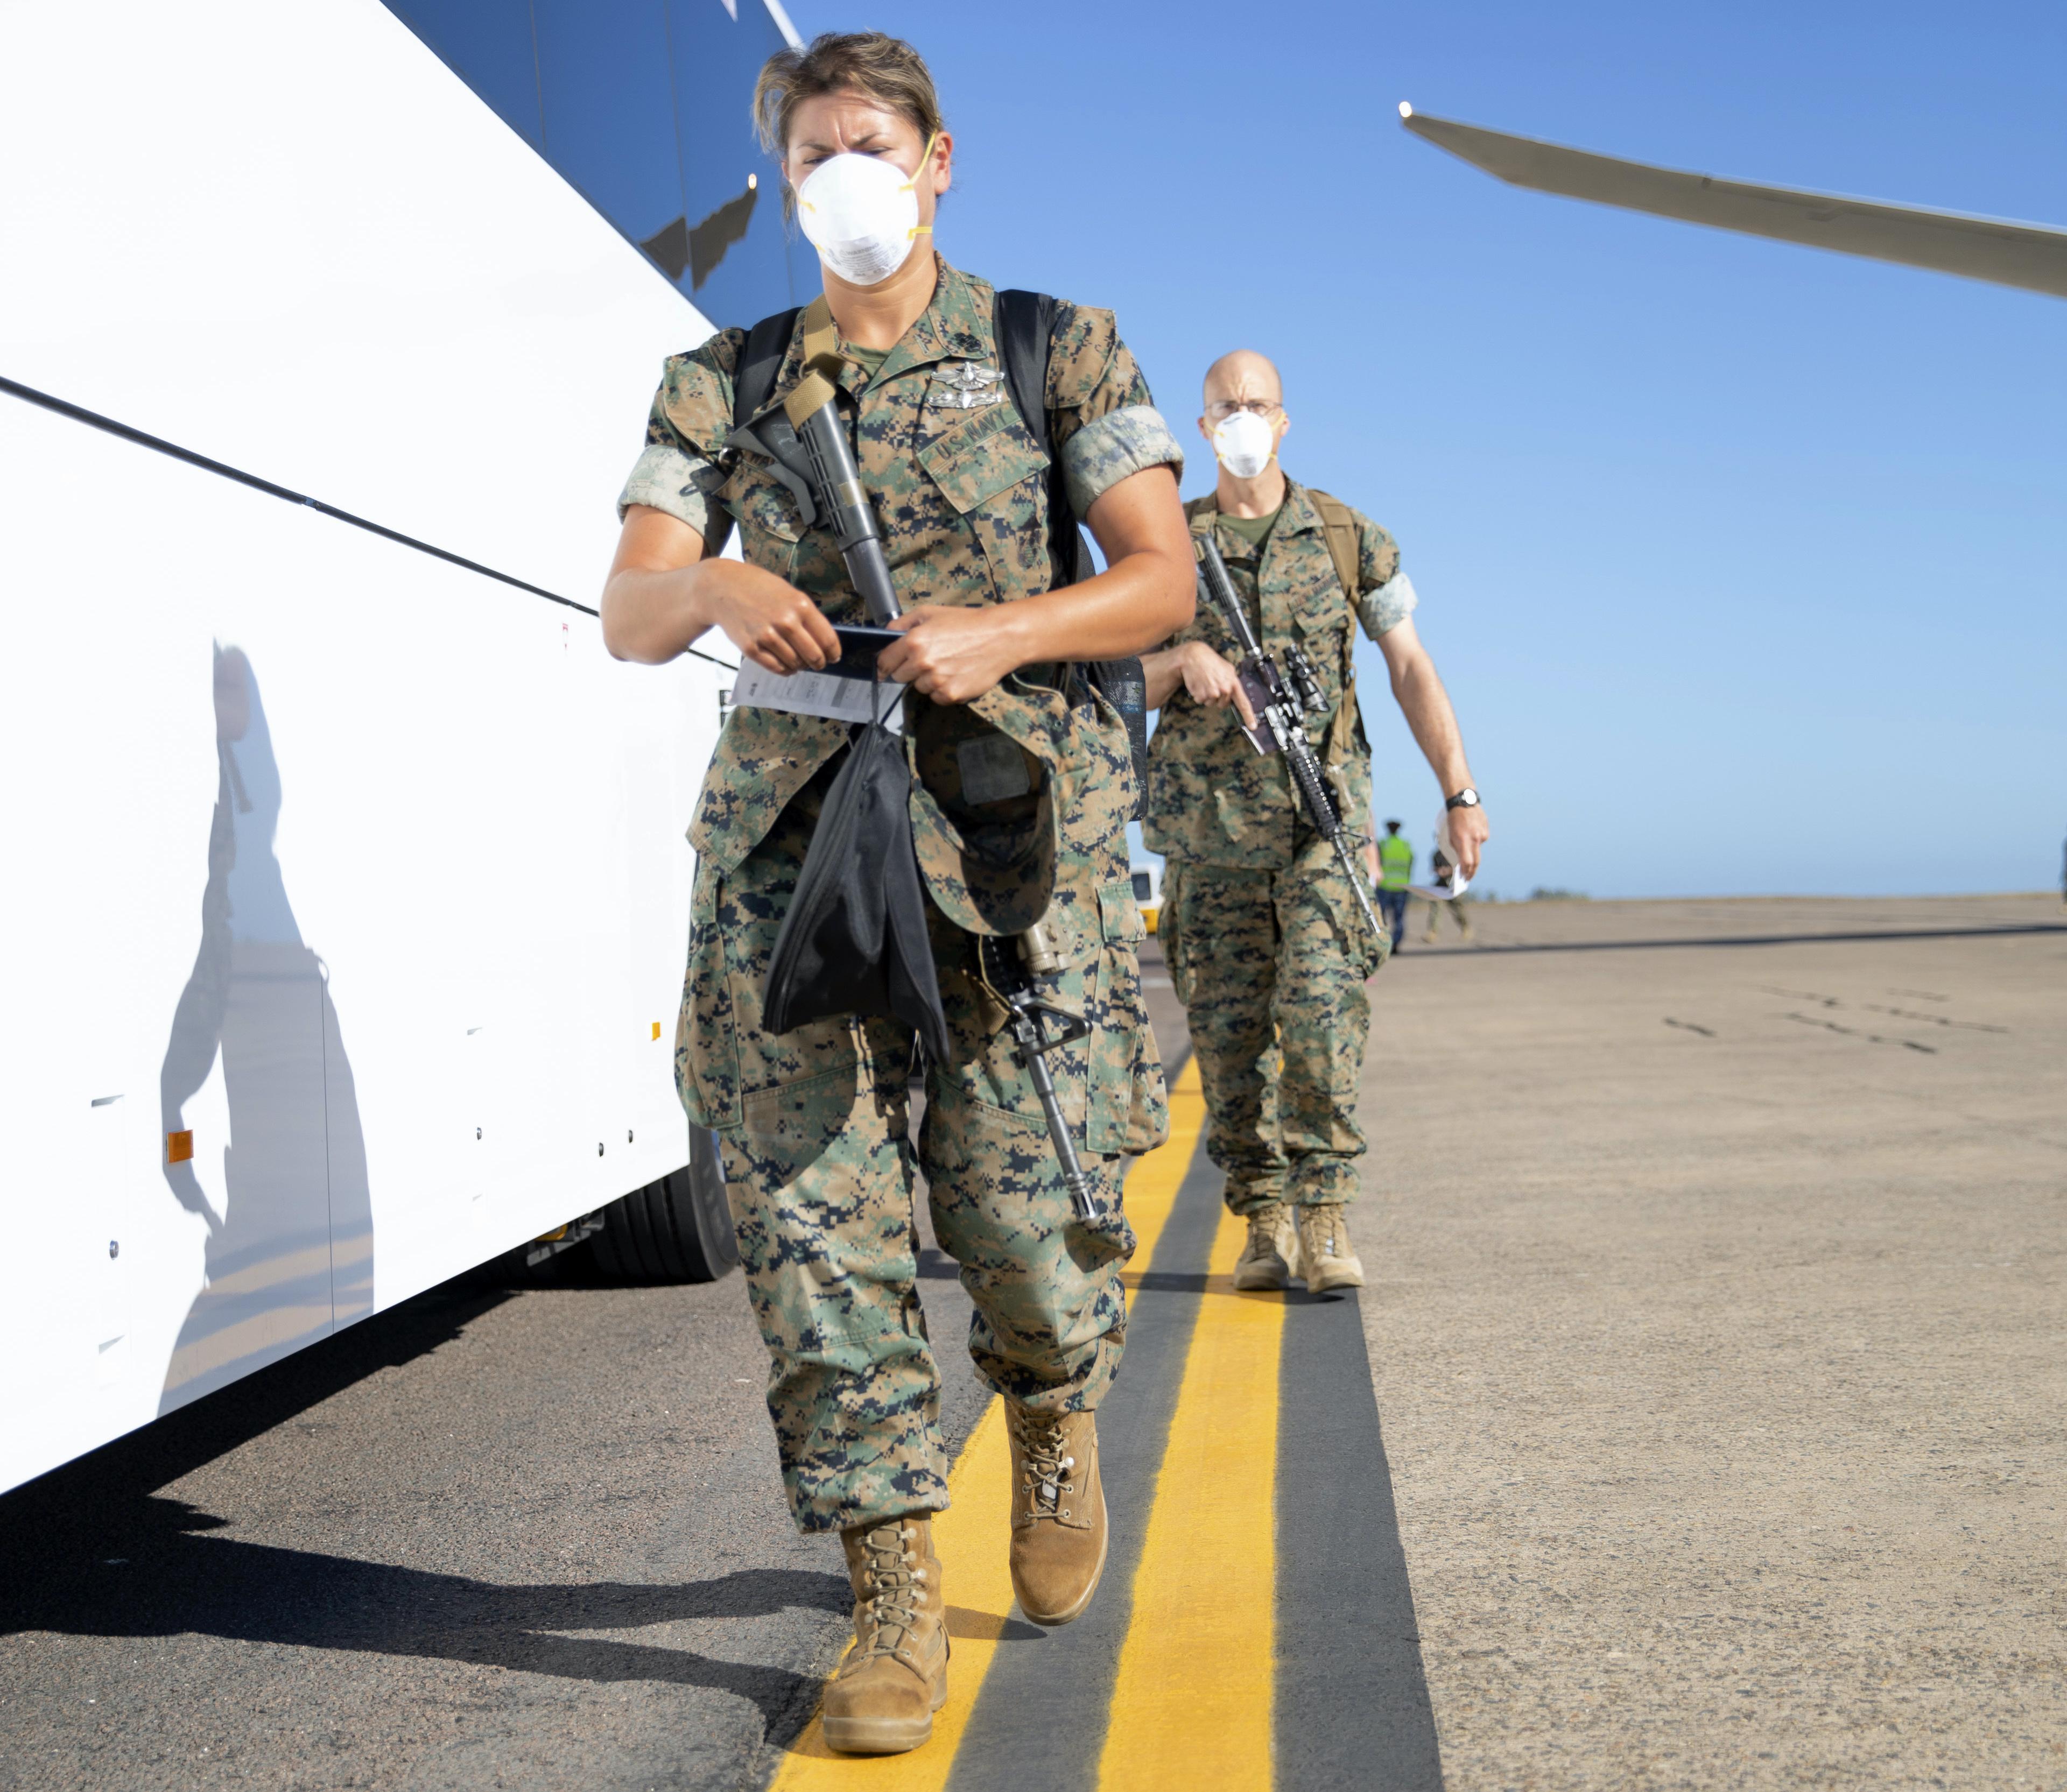 Flyover • U.S. Marines and Sailors • Marine Rotational Force – (MRF-D) • Darwin, Australia